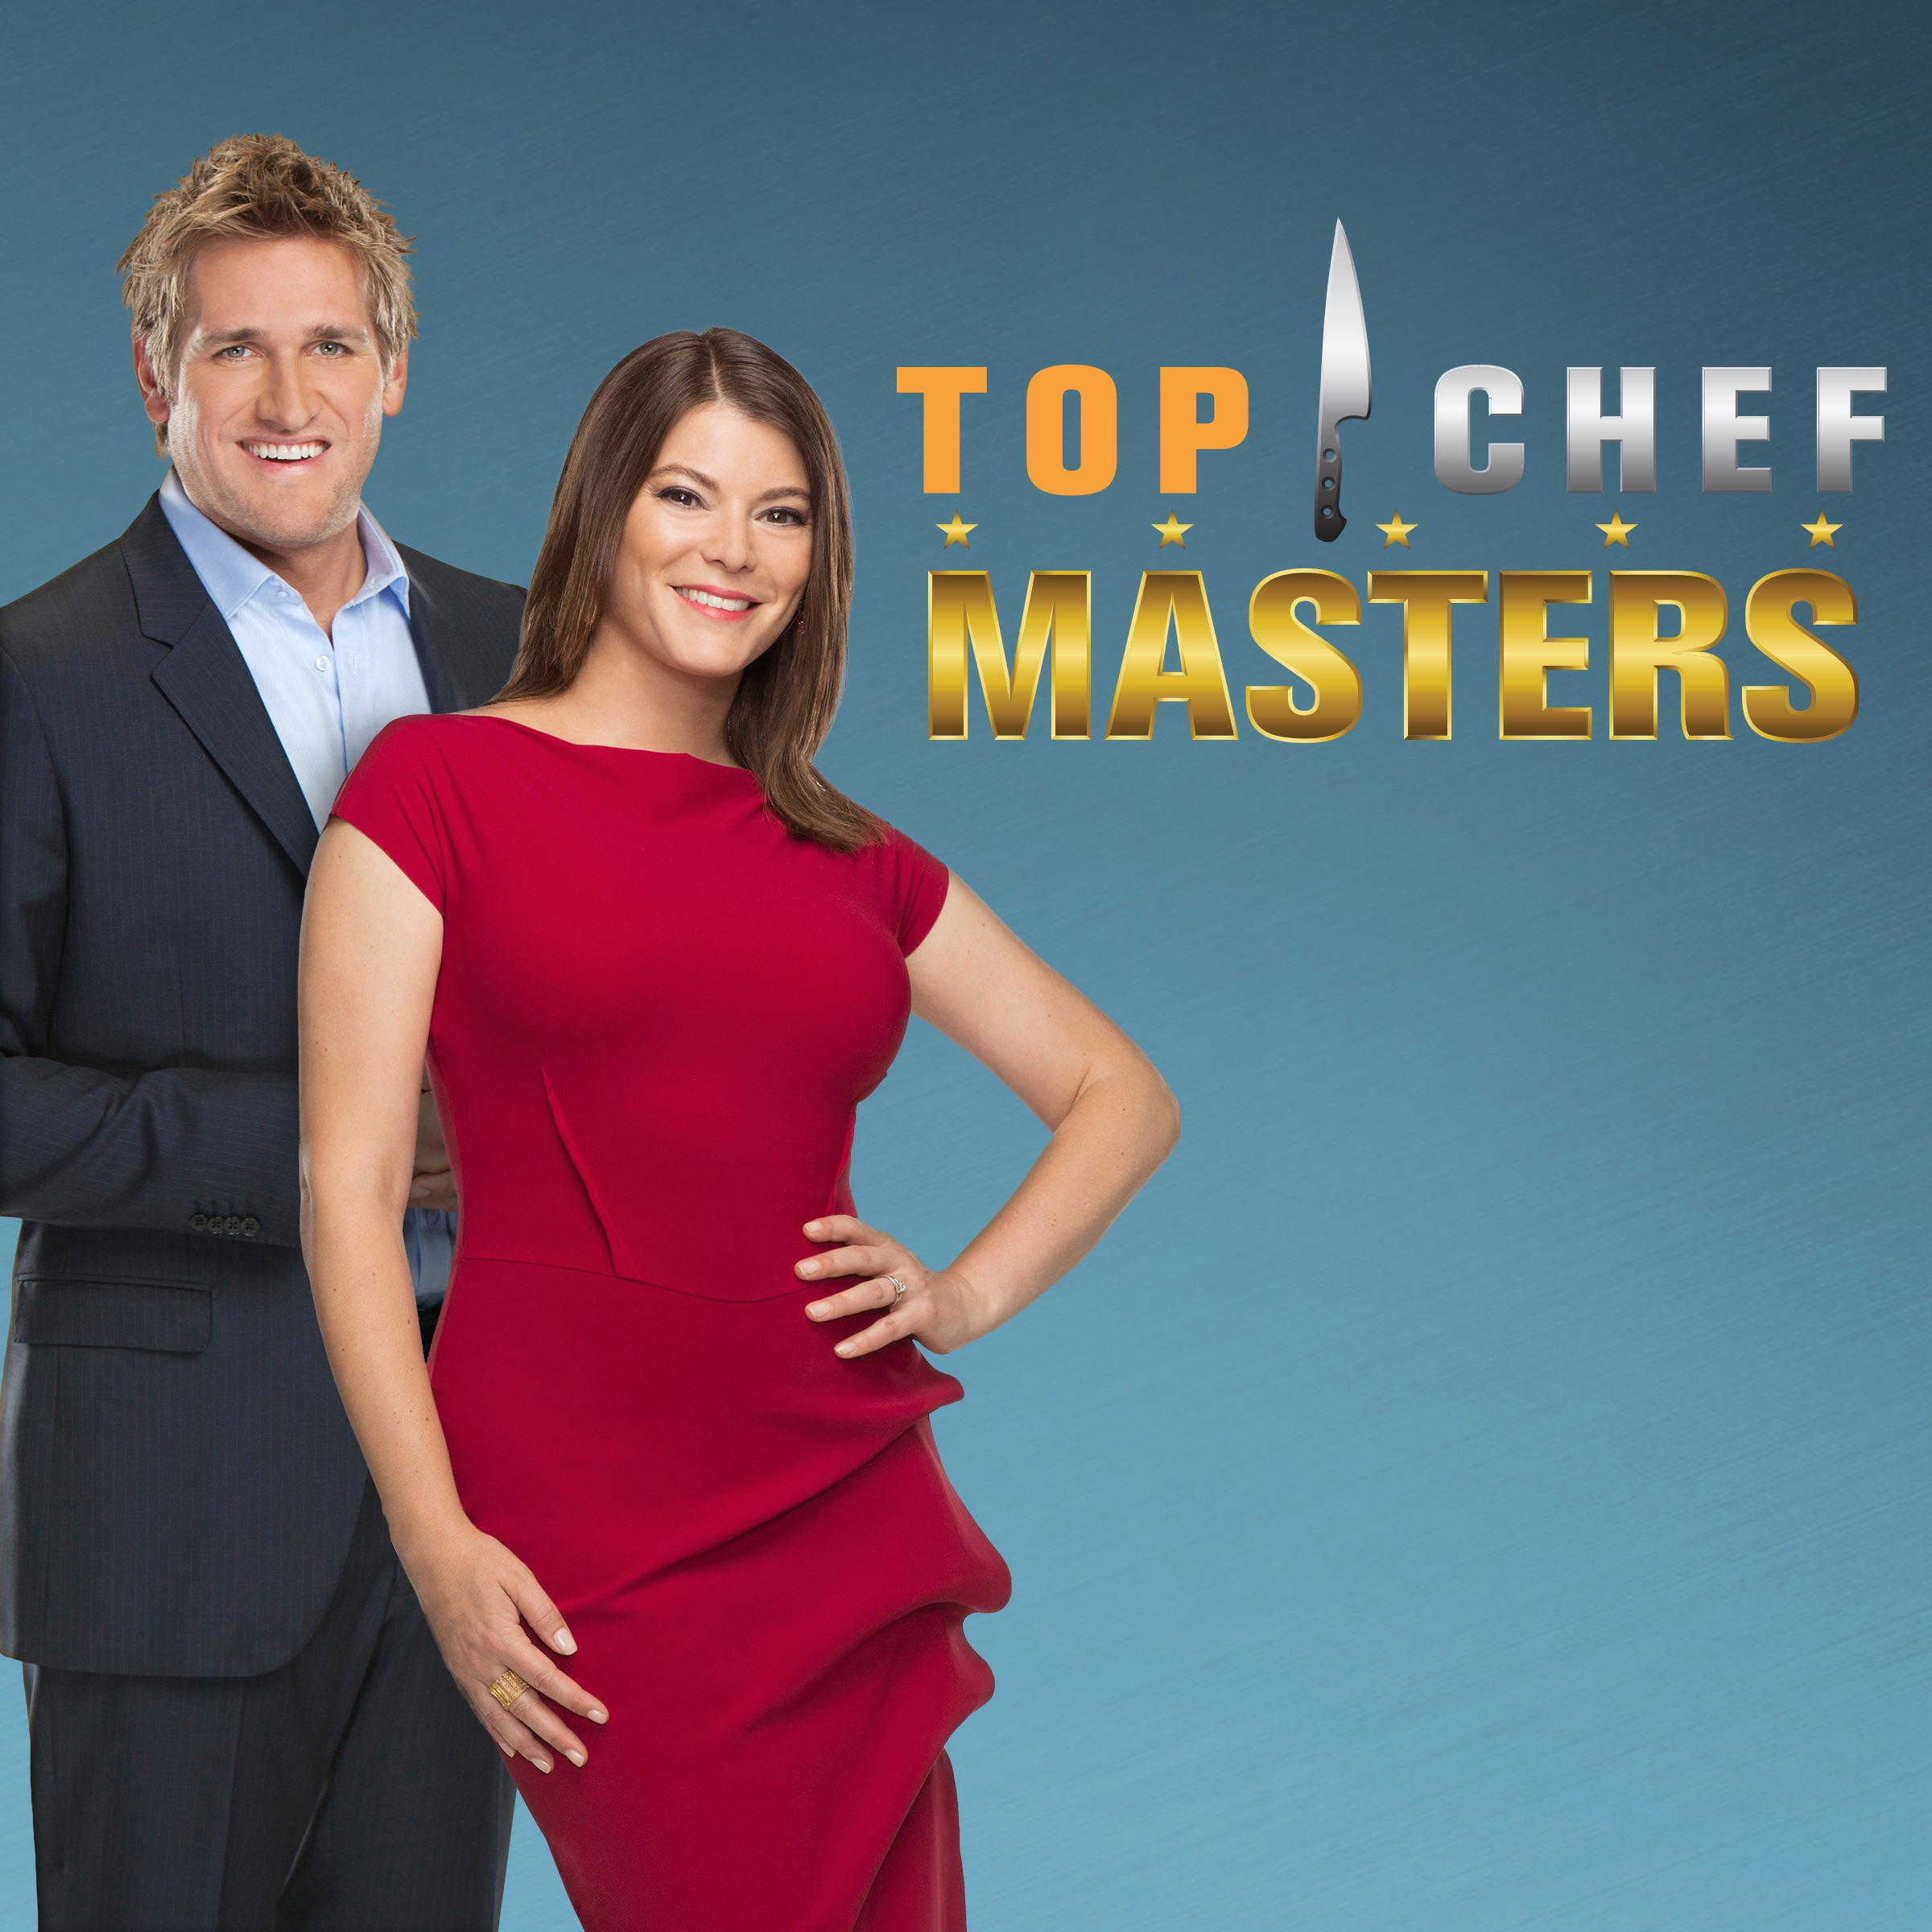 Top chef masters season 4 episode 10 online / Atom man vs